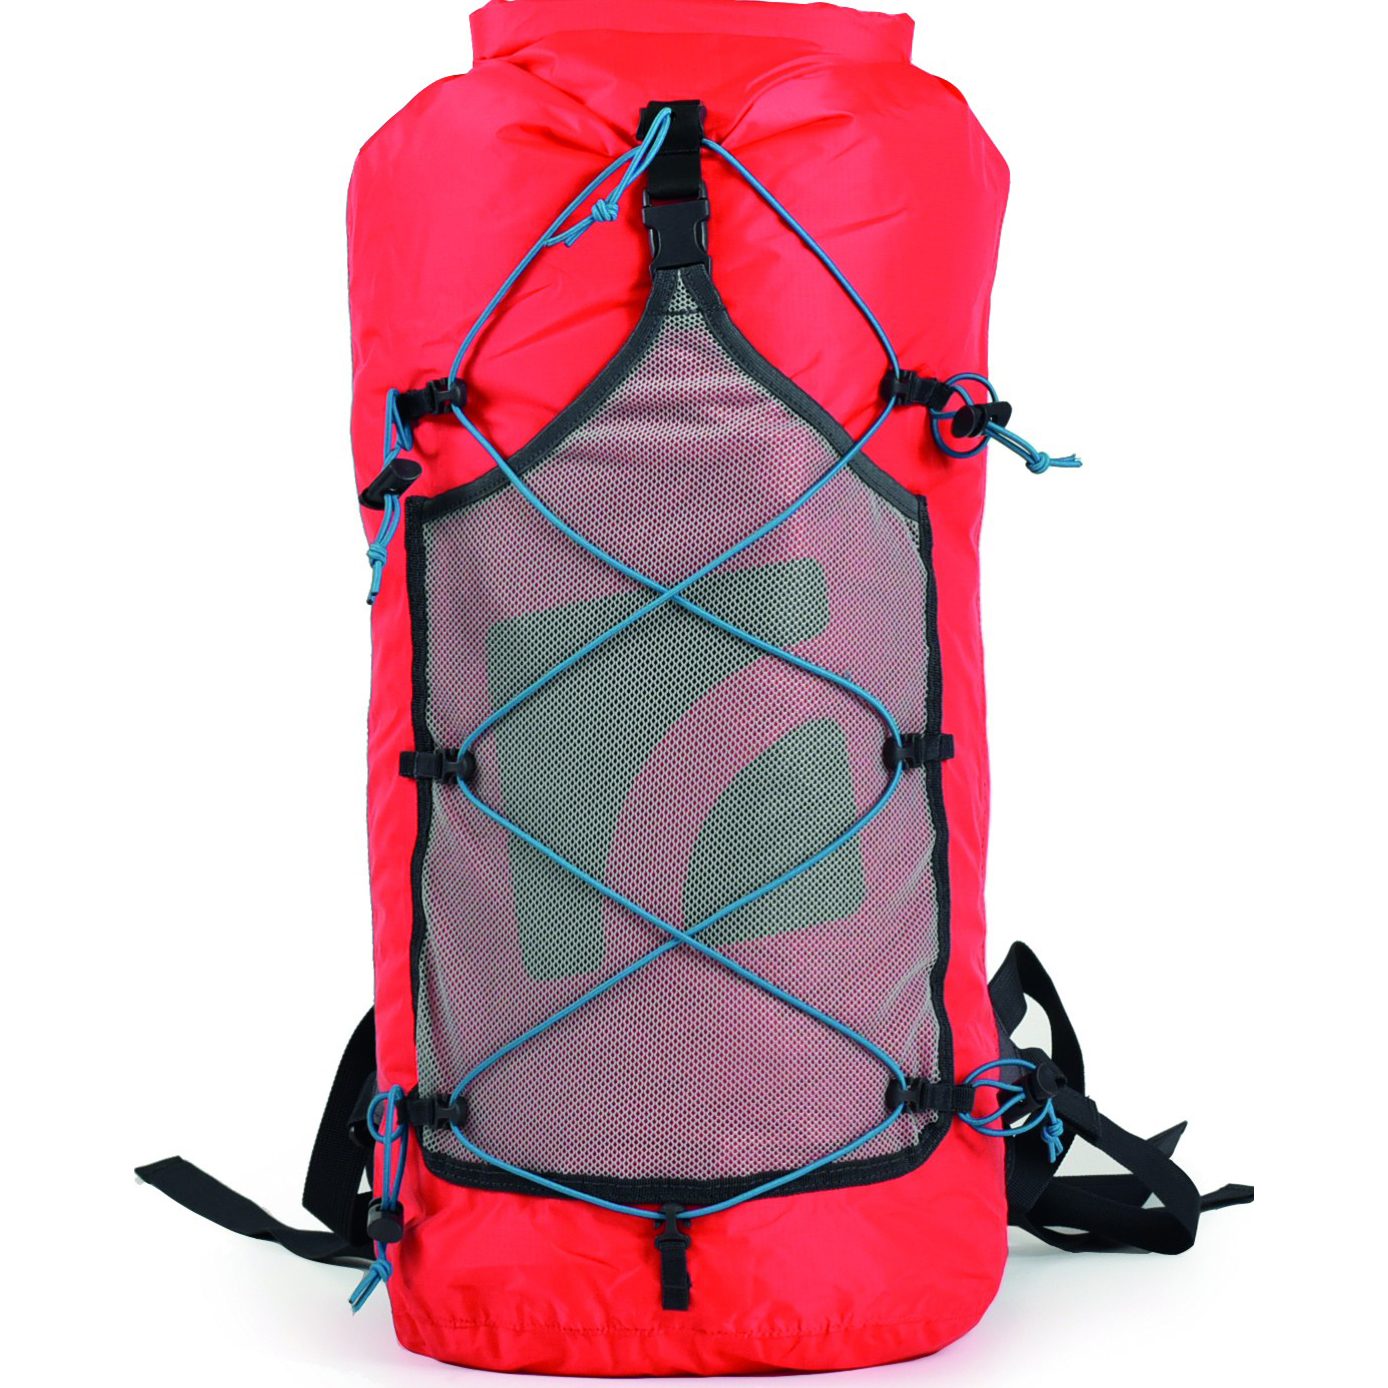 Trekmates Drypack 30L Su Geçirmez Sırt Çantası TM-X10759-30L Scarlet